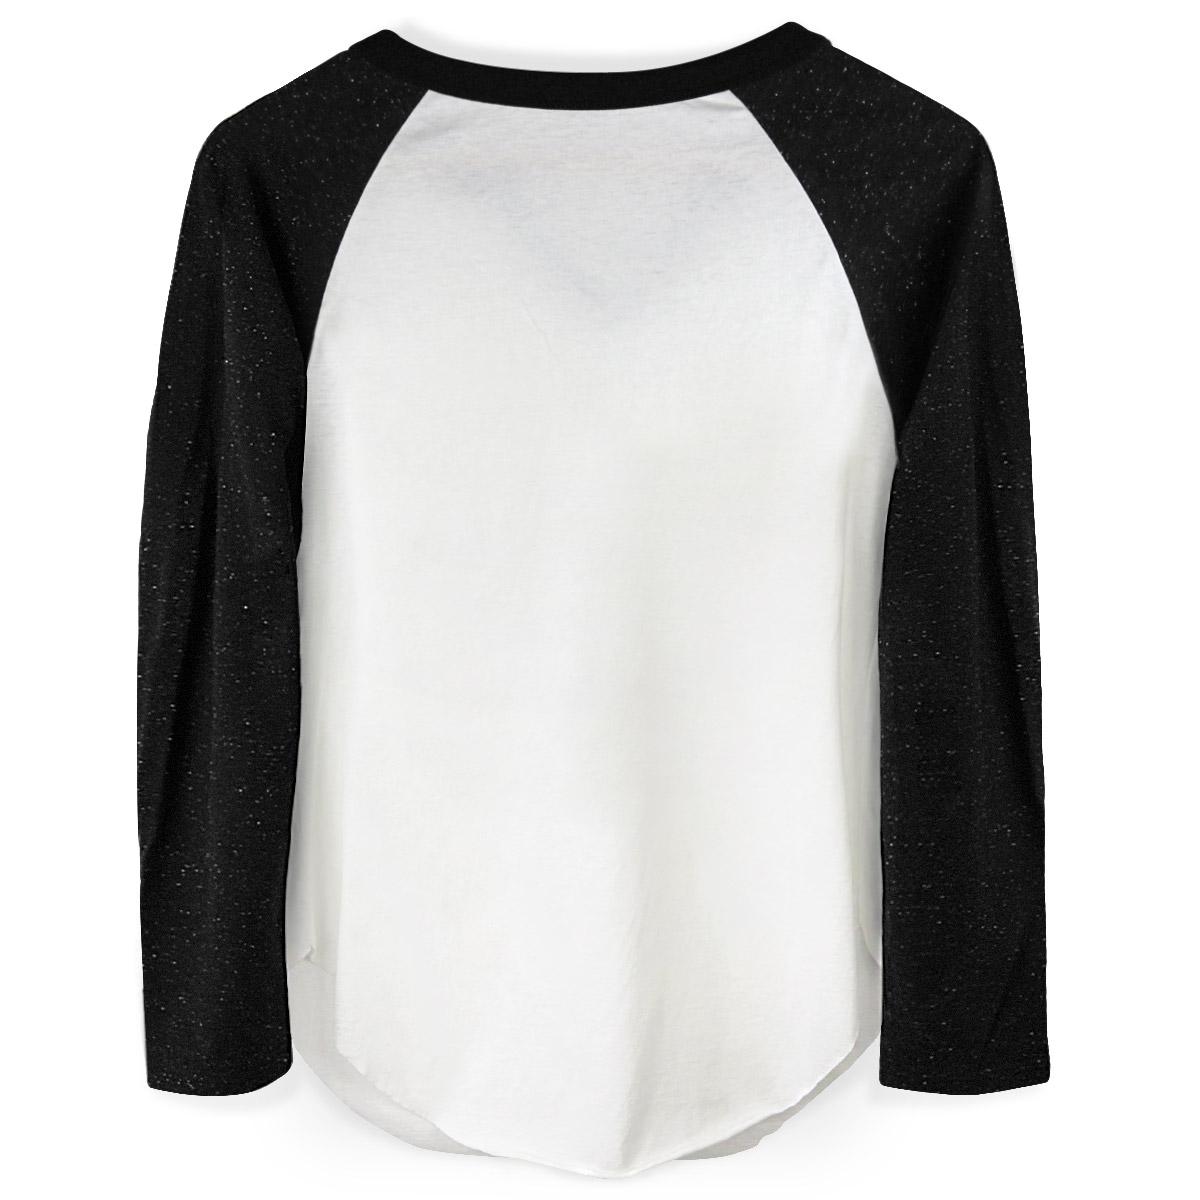 Camiseta Manga Longa Feminina Thiaguinho #Vamo #Vamo